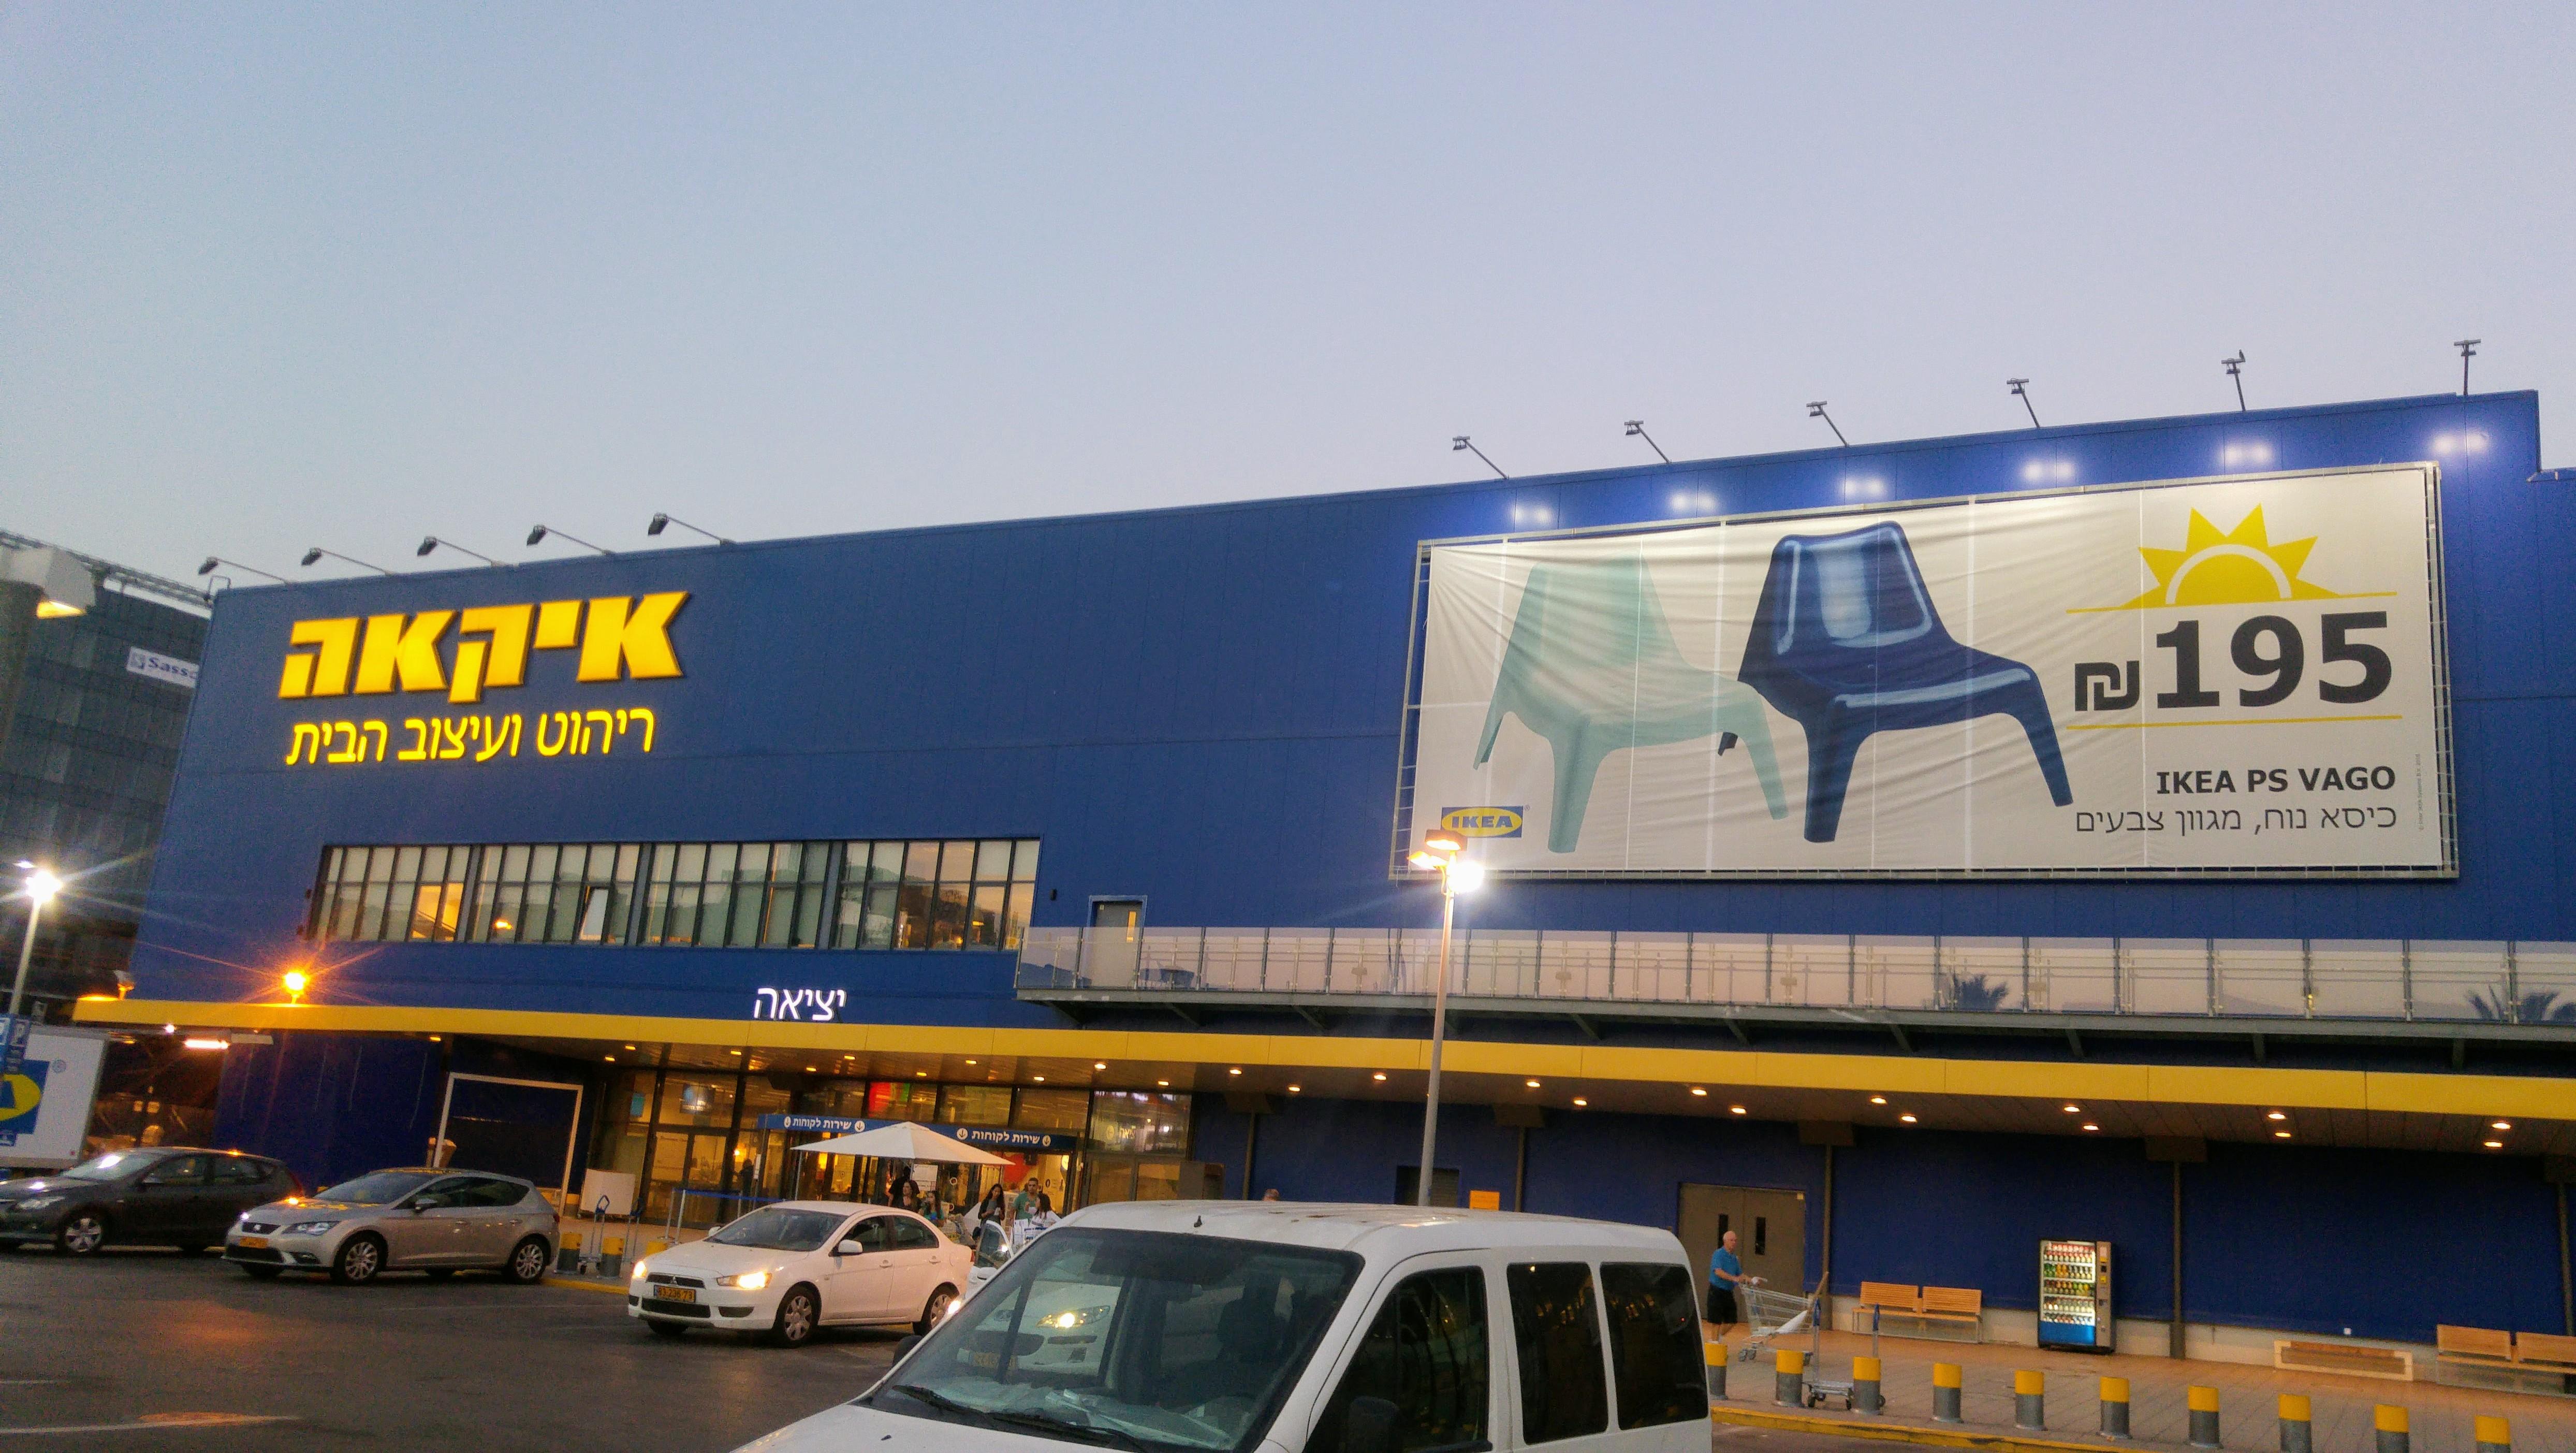 File:Ikea branch, Netanya, Israel.jpg - Wikimedia Commons